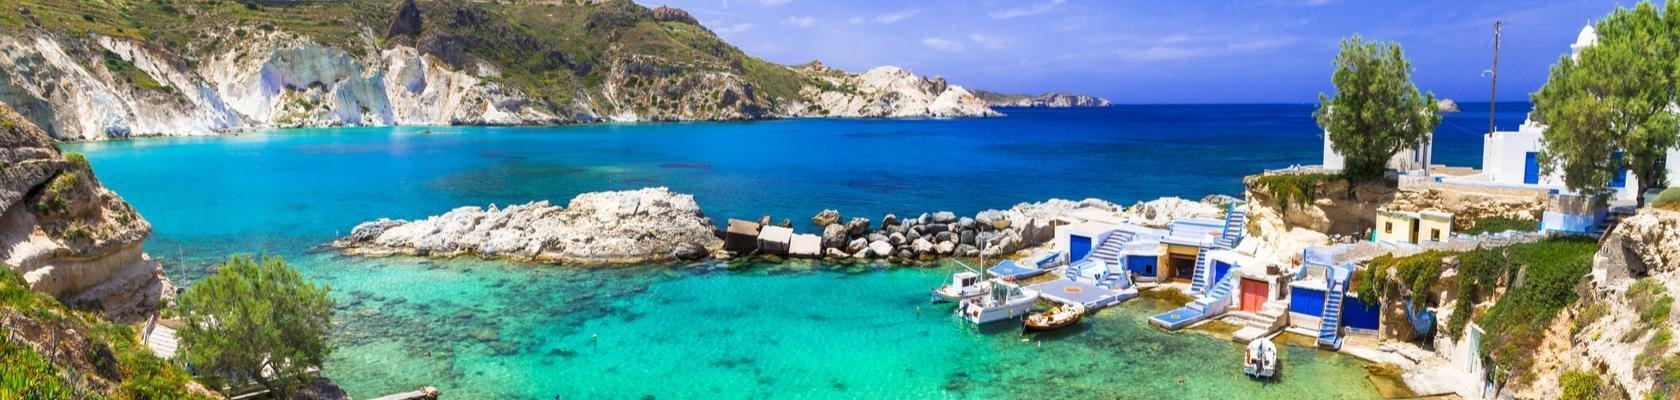 Het vissersdorpje Mandrakia op Milos